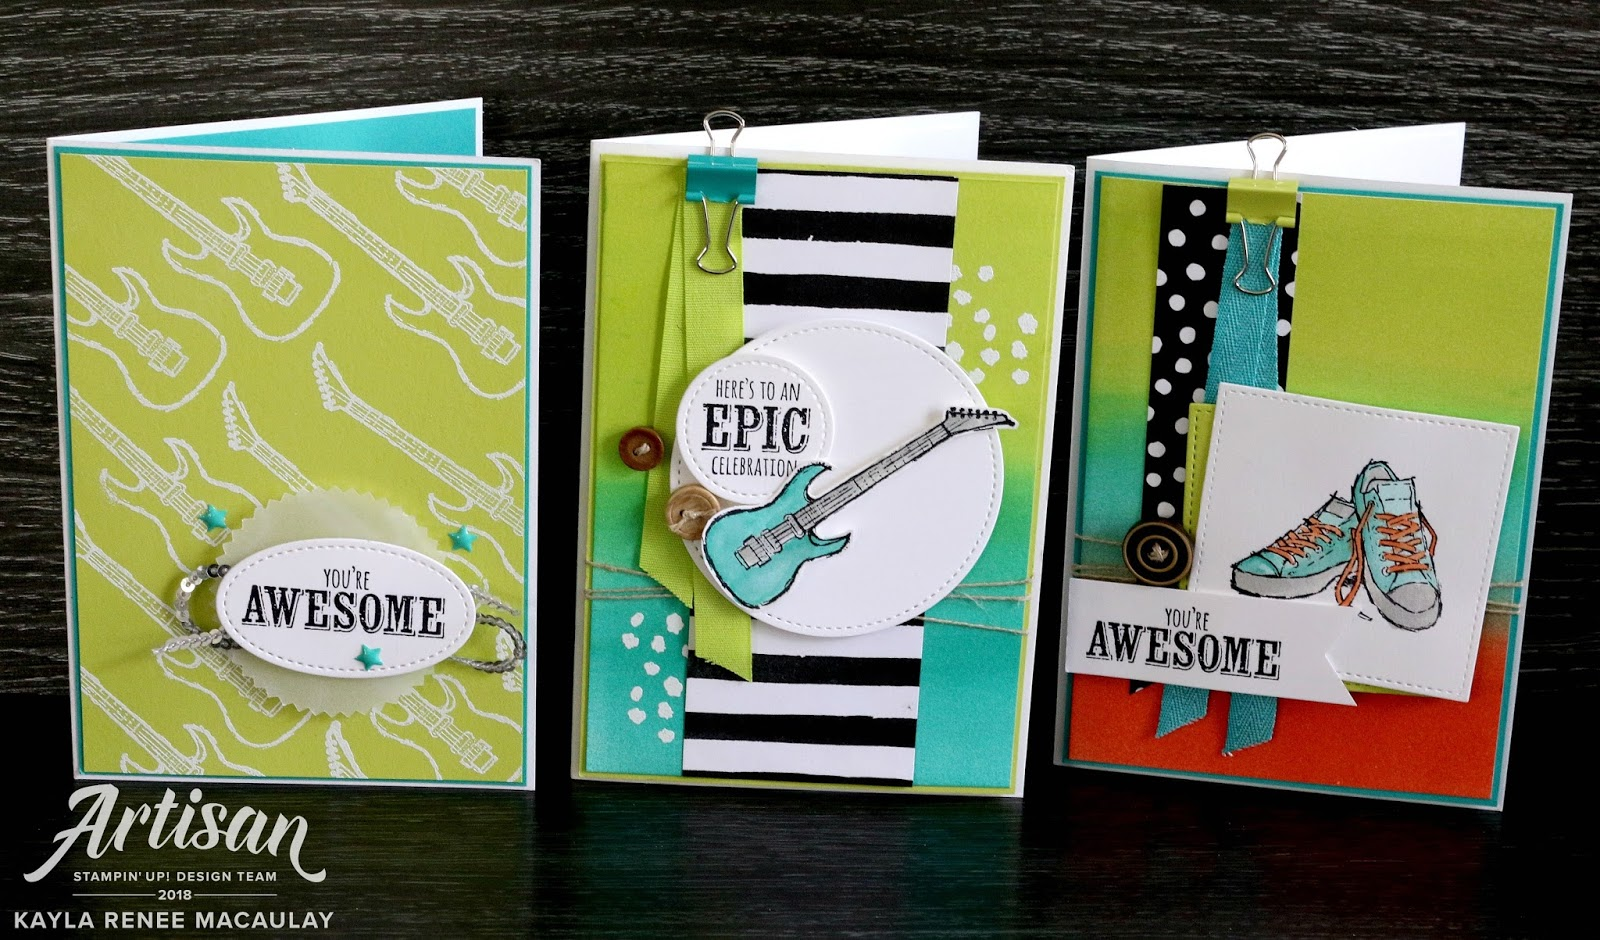 Epic Celebration – Stampin' Up! Artisan Blog Hop